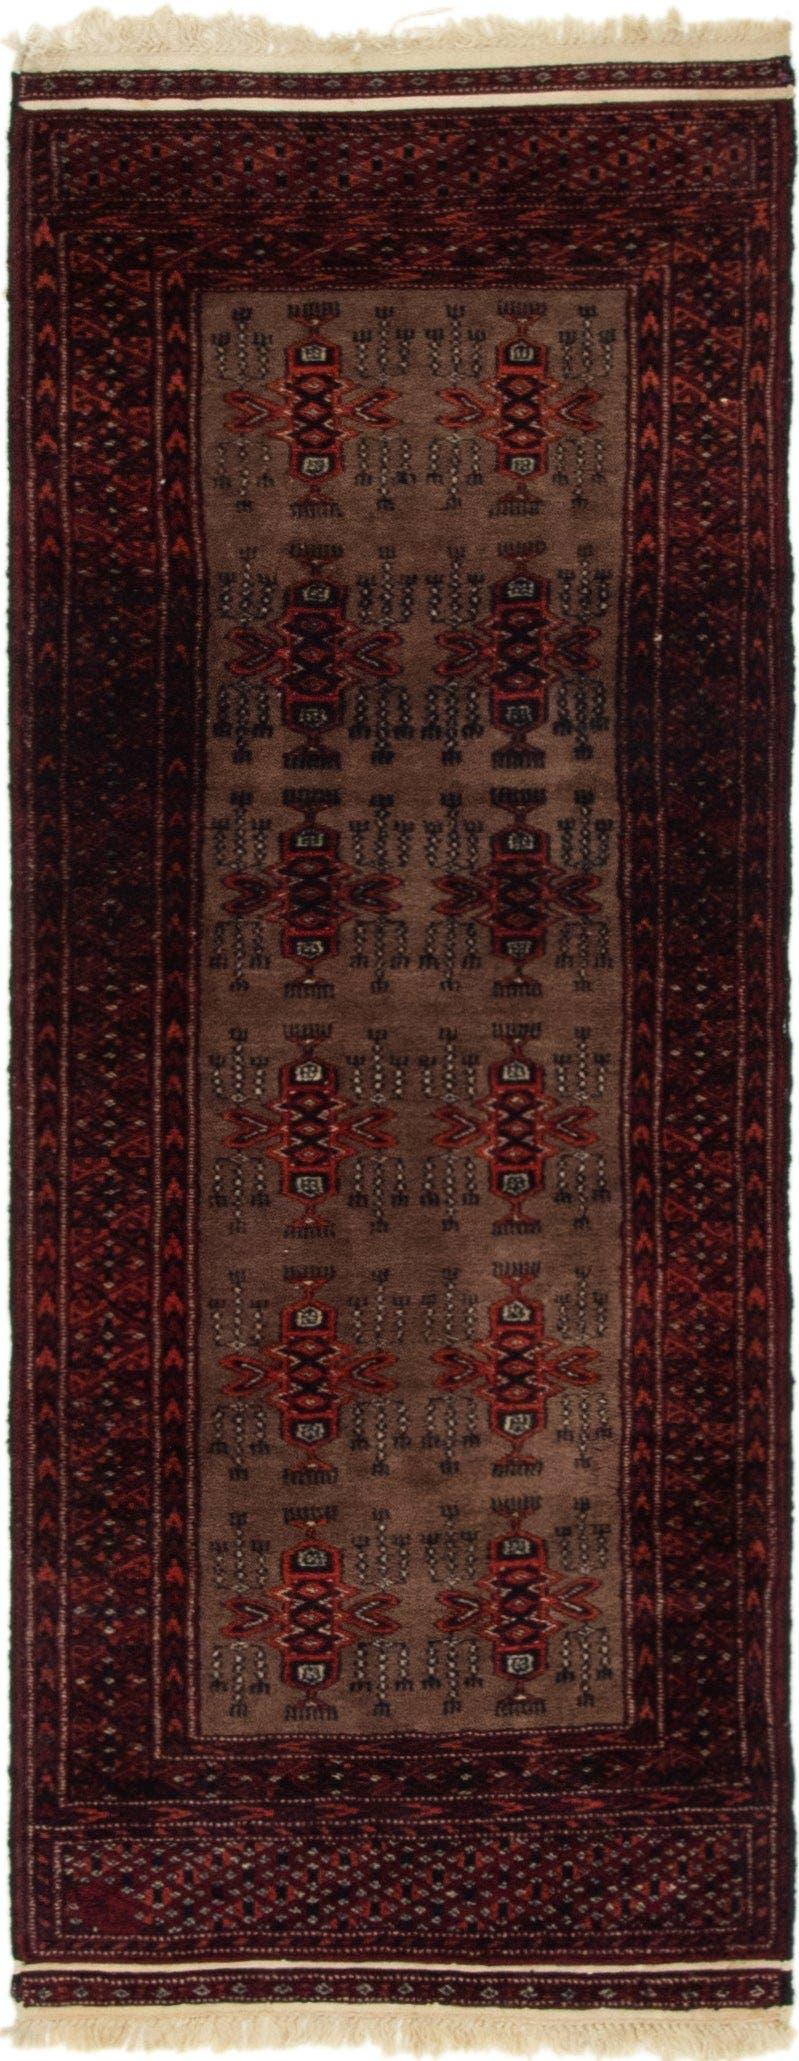 2' x 5' Bokhara Oriental Runner Rug main image